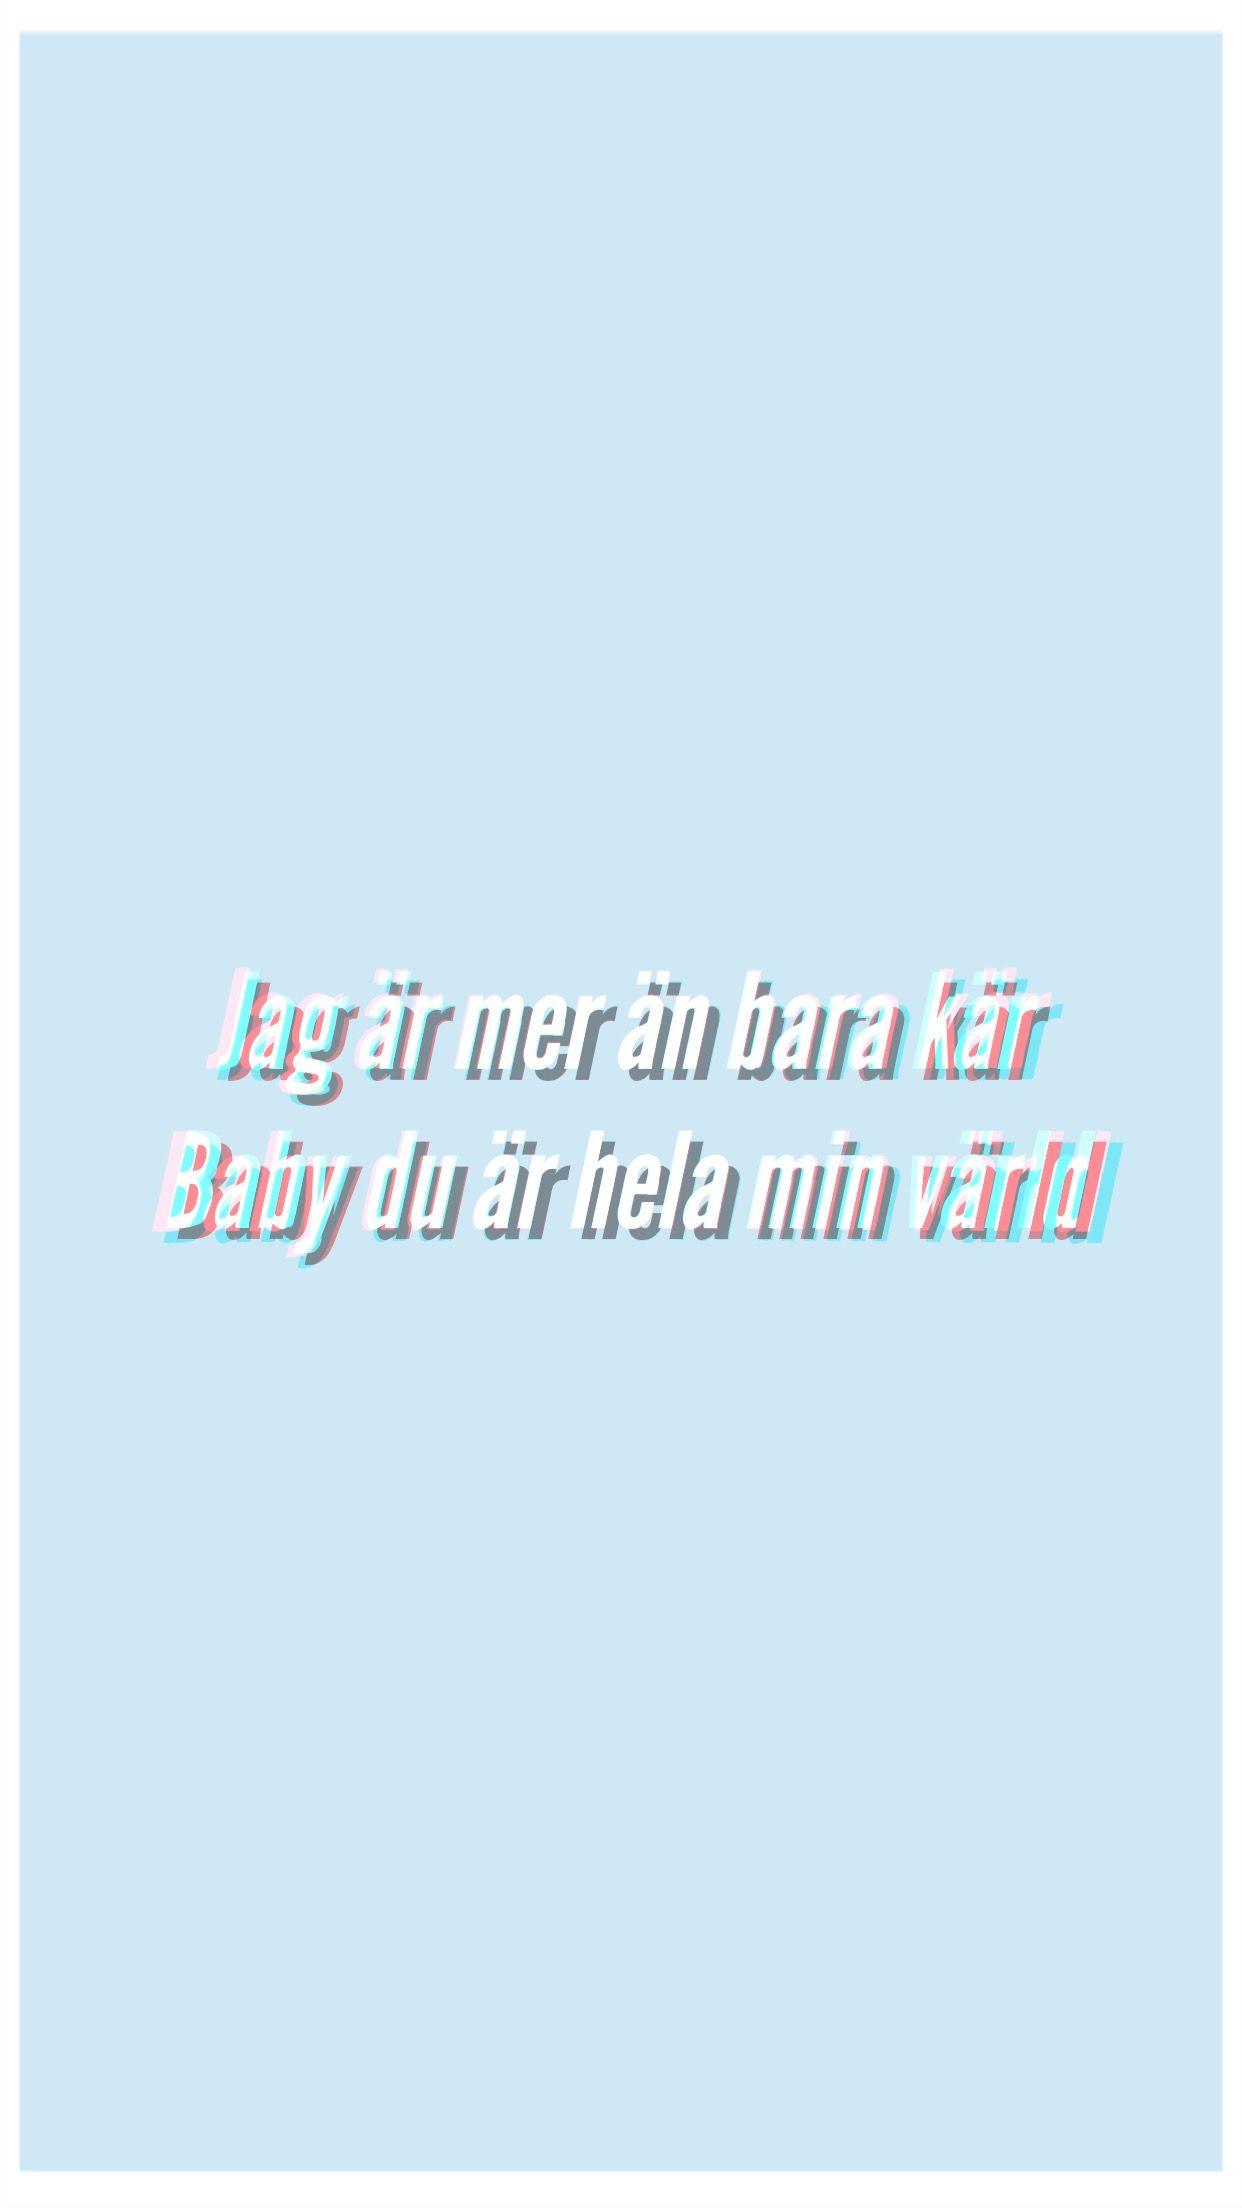 Hov1 Quote Lyric Vi Var Backrundsbild Citat Fran Sanger Instagram Citat Citat Om Honom